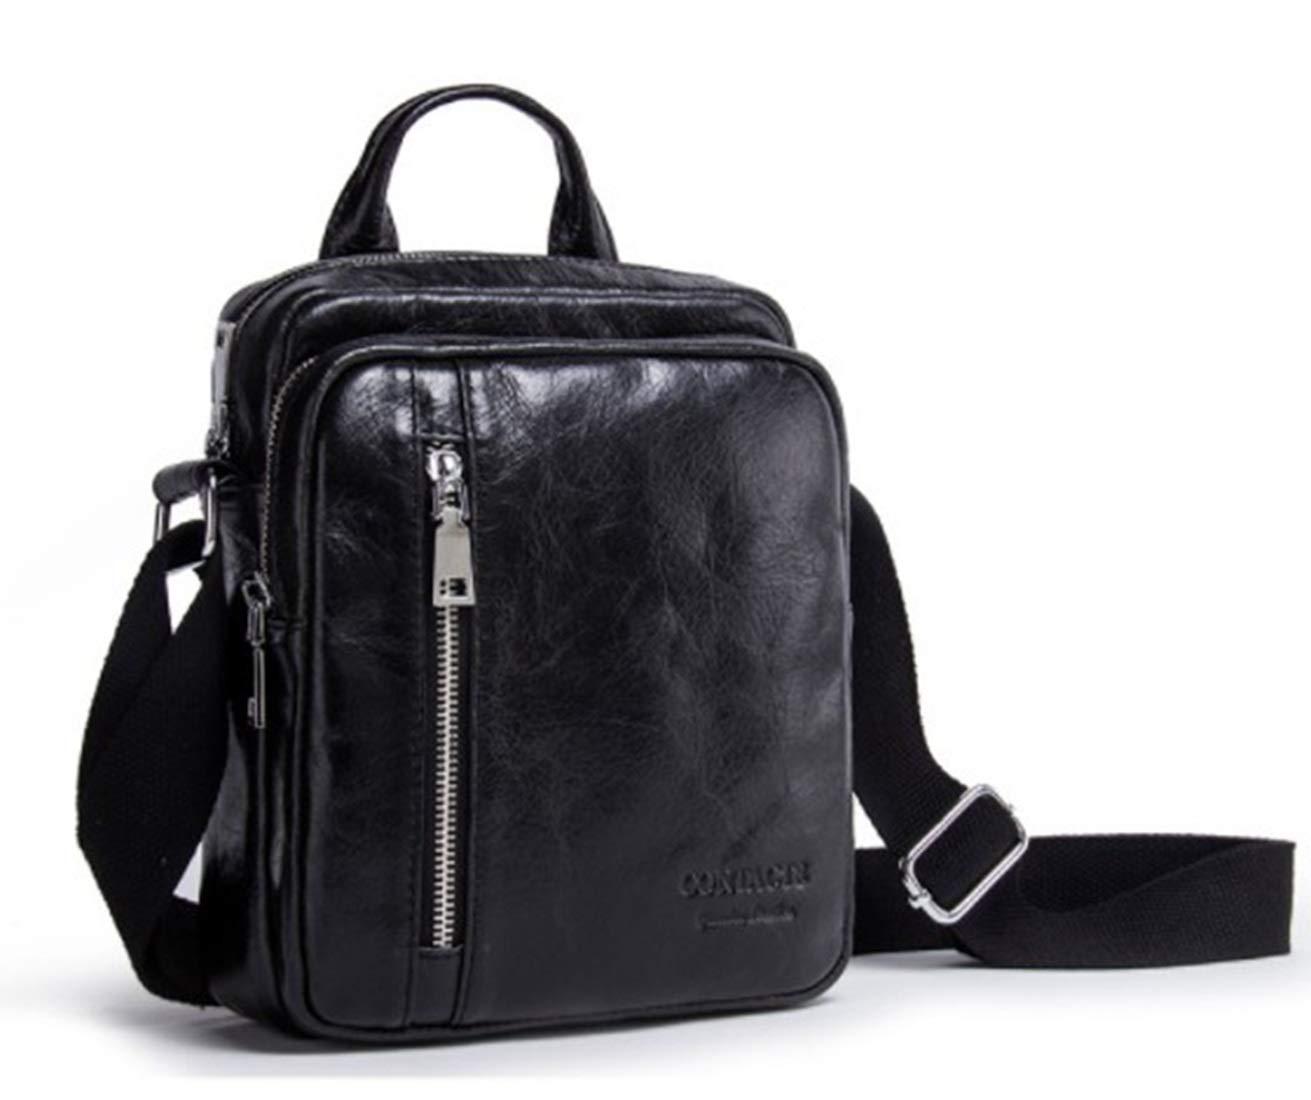 Color : Gray KRPENRIO Mens Messenger Shoulder Bag Vintage Leather Briefcase Crossbody Day Bag for School and Work